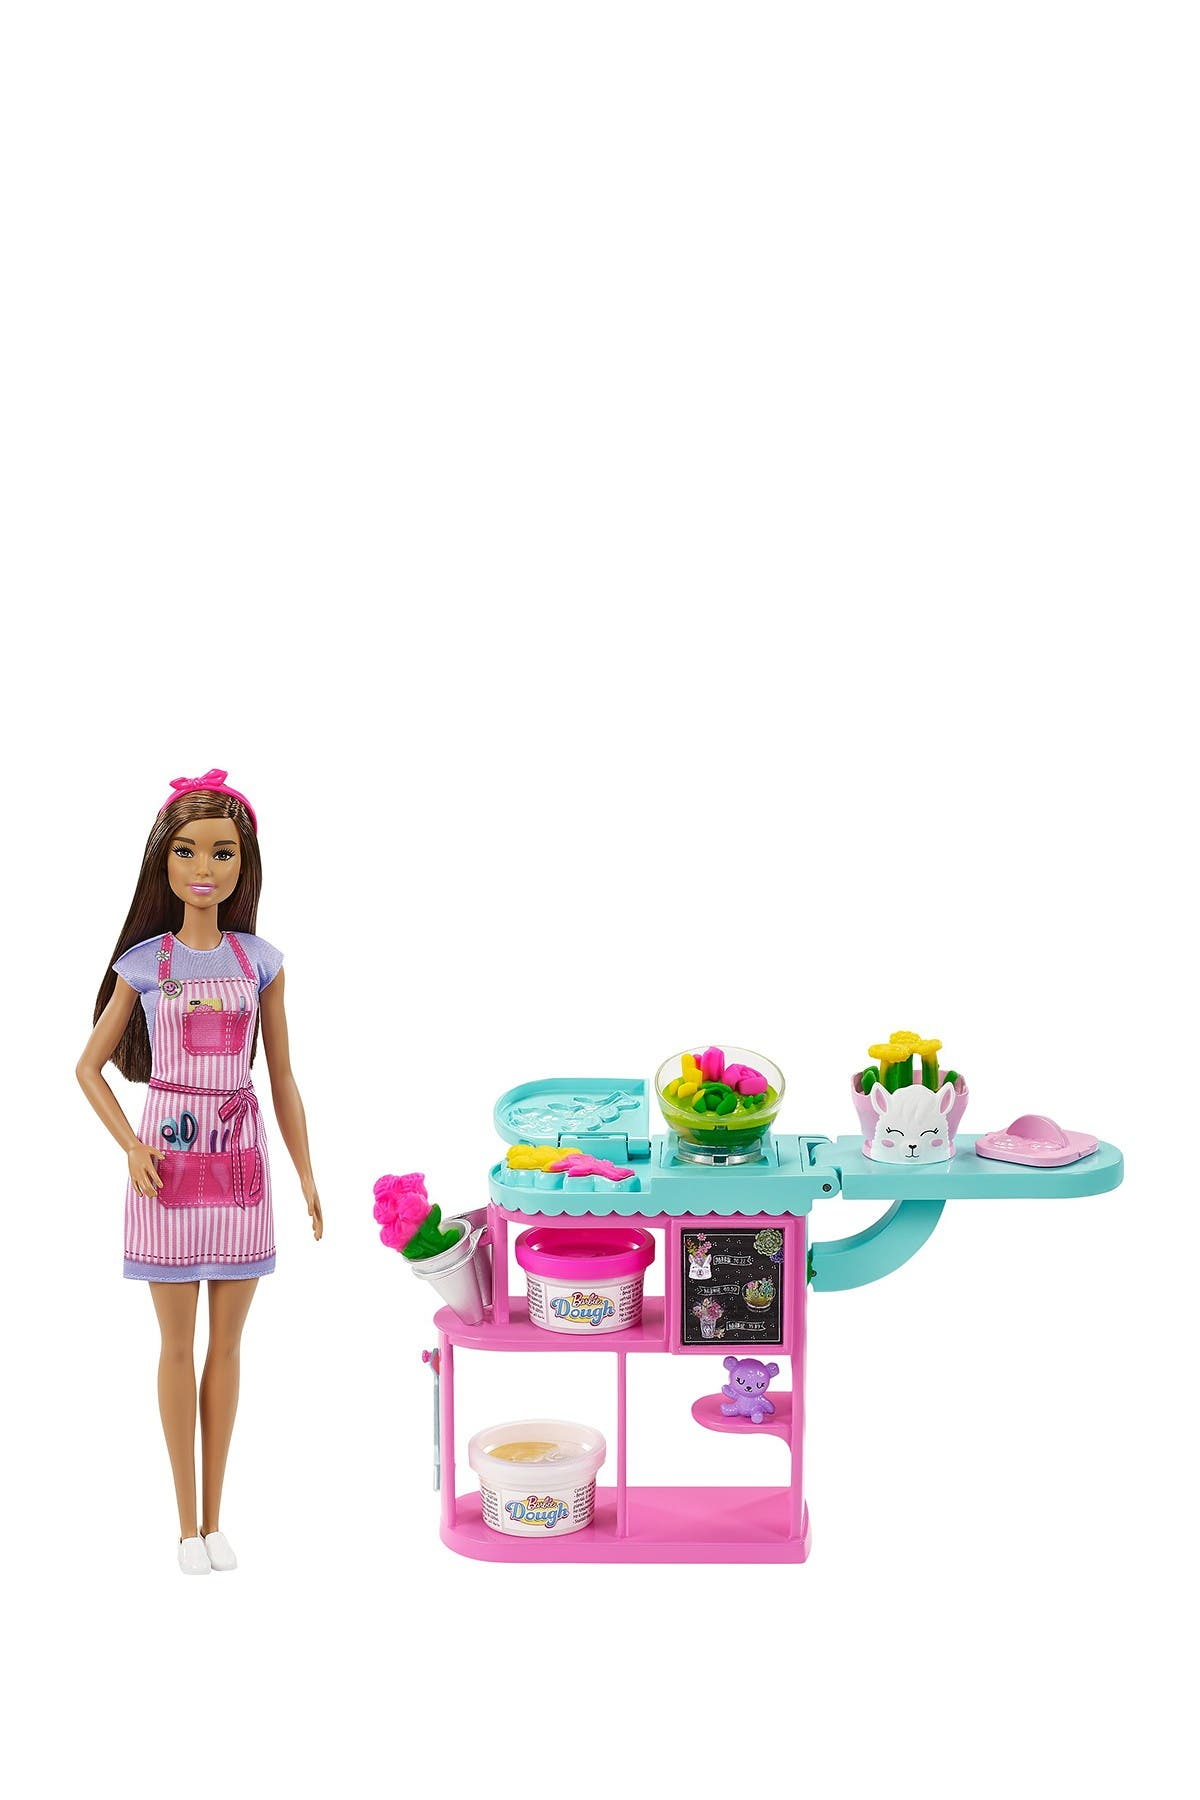 Image of Mattel Barbie® Florest Doll & Play Dough Playset - Brunette